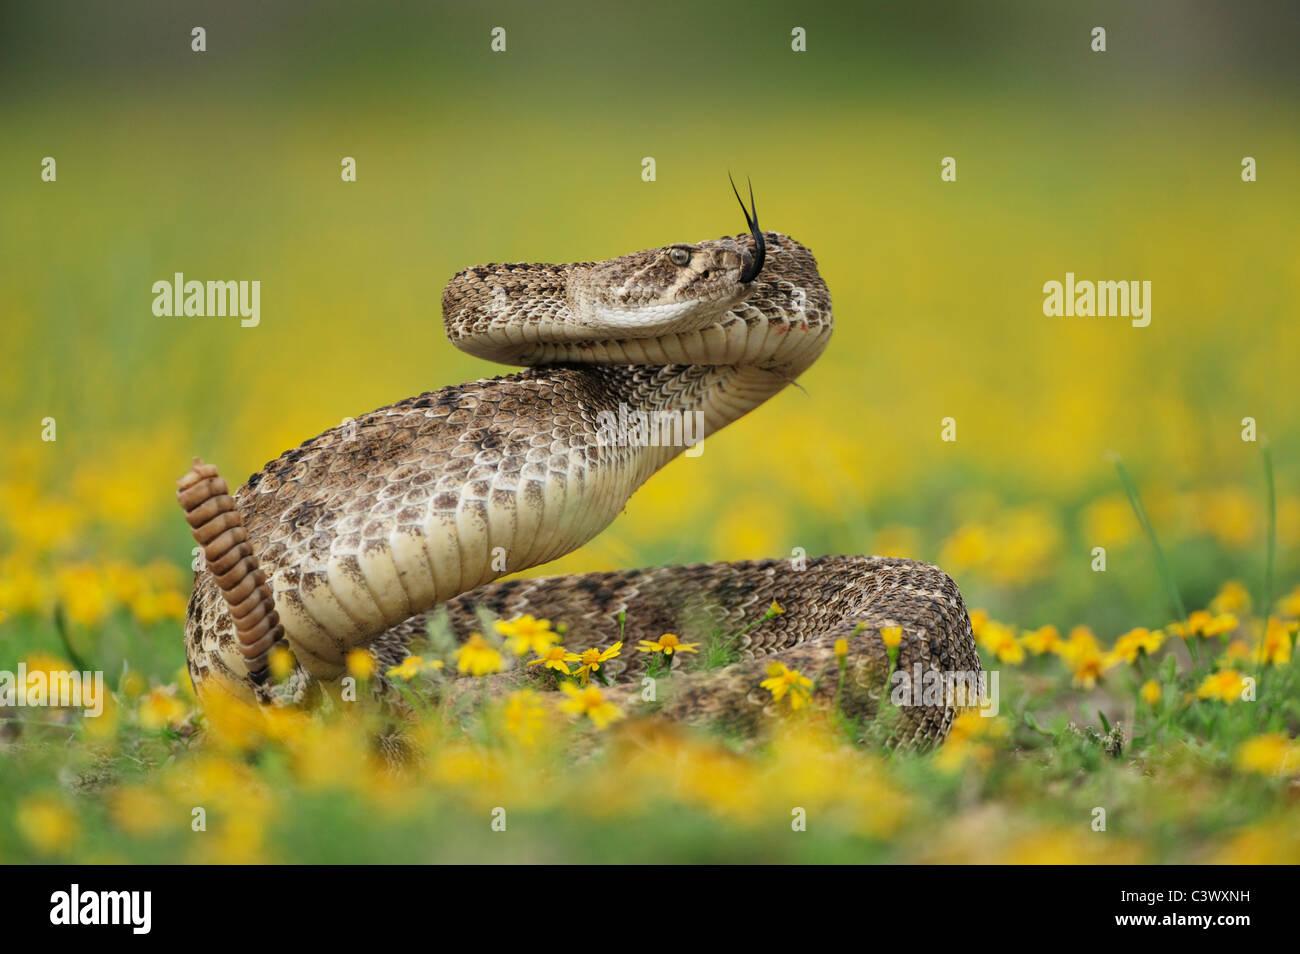 Western Diamondback Rattlesnake (Crotalus atrox), adult in striking pose in wildflower field, Laredo, Webb County, - Stock Image